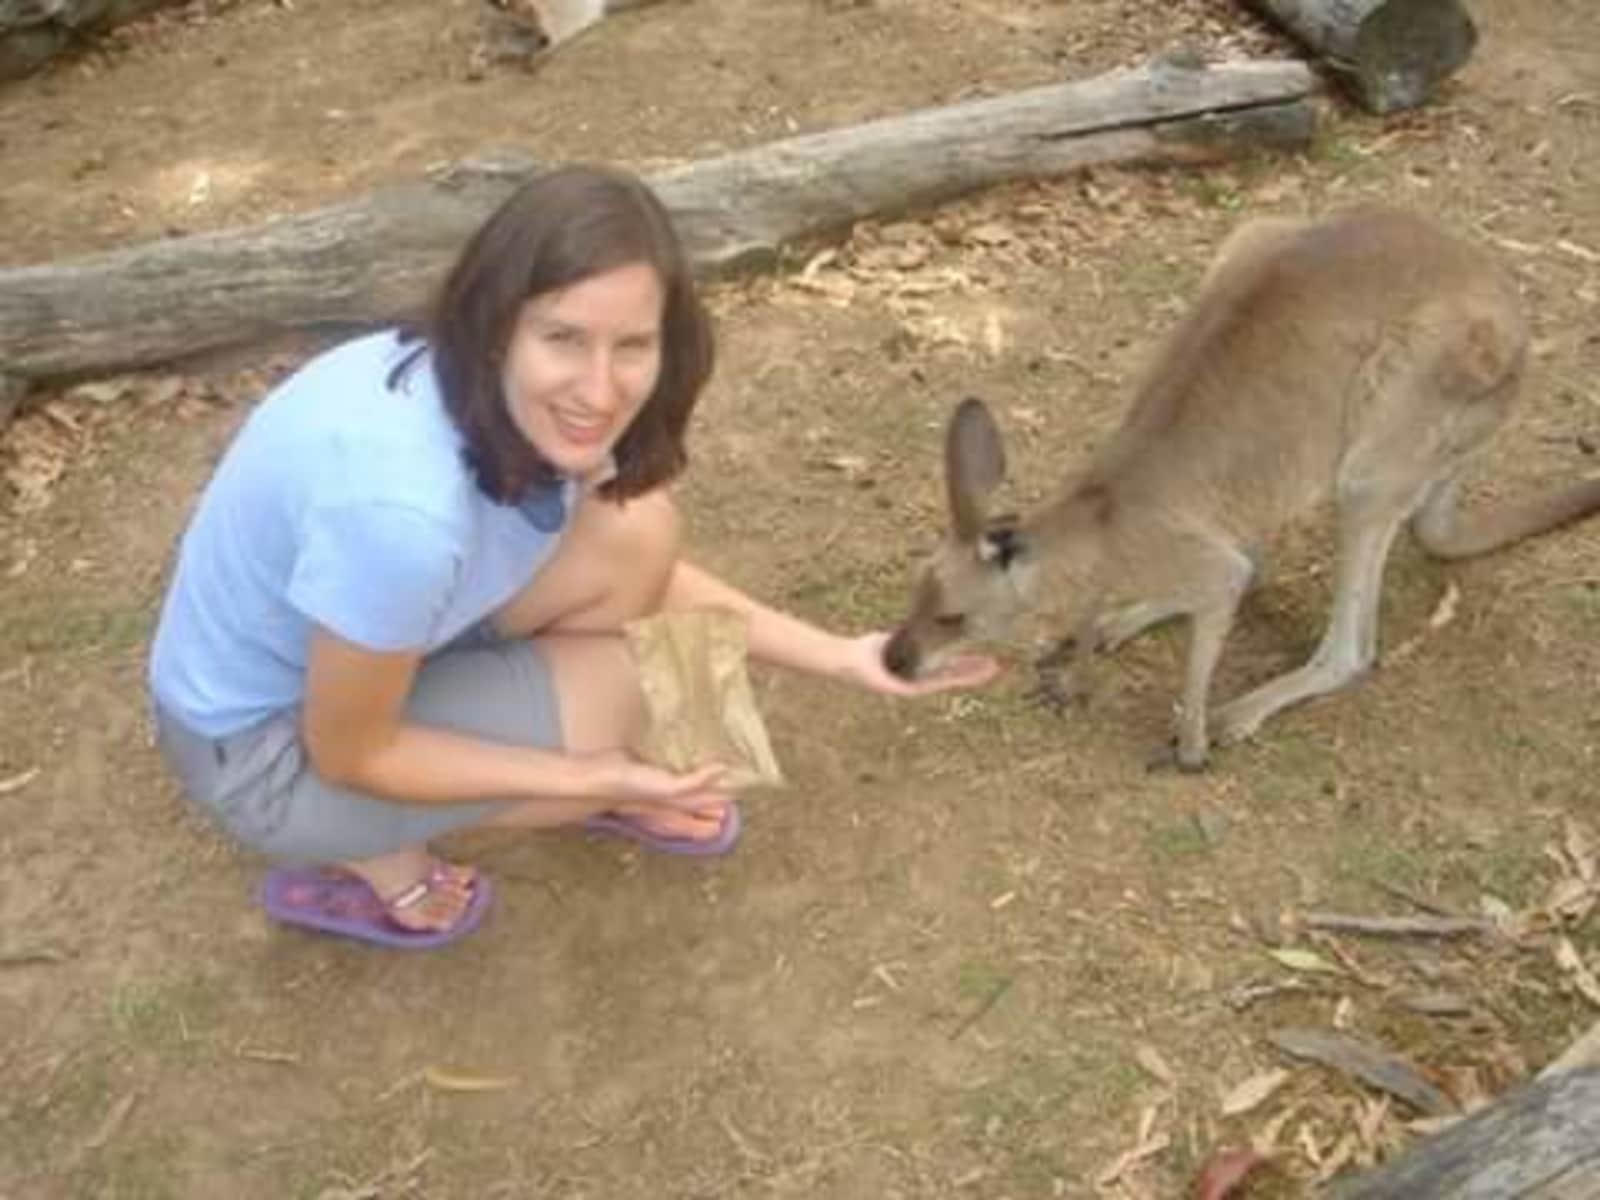 Joanne from Sydney, New South Wales, Australia